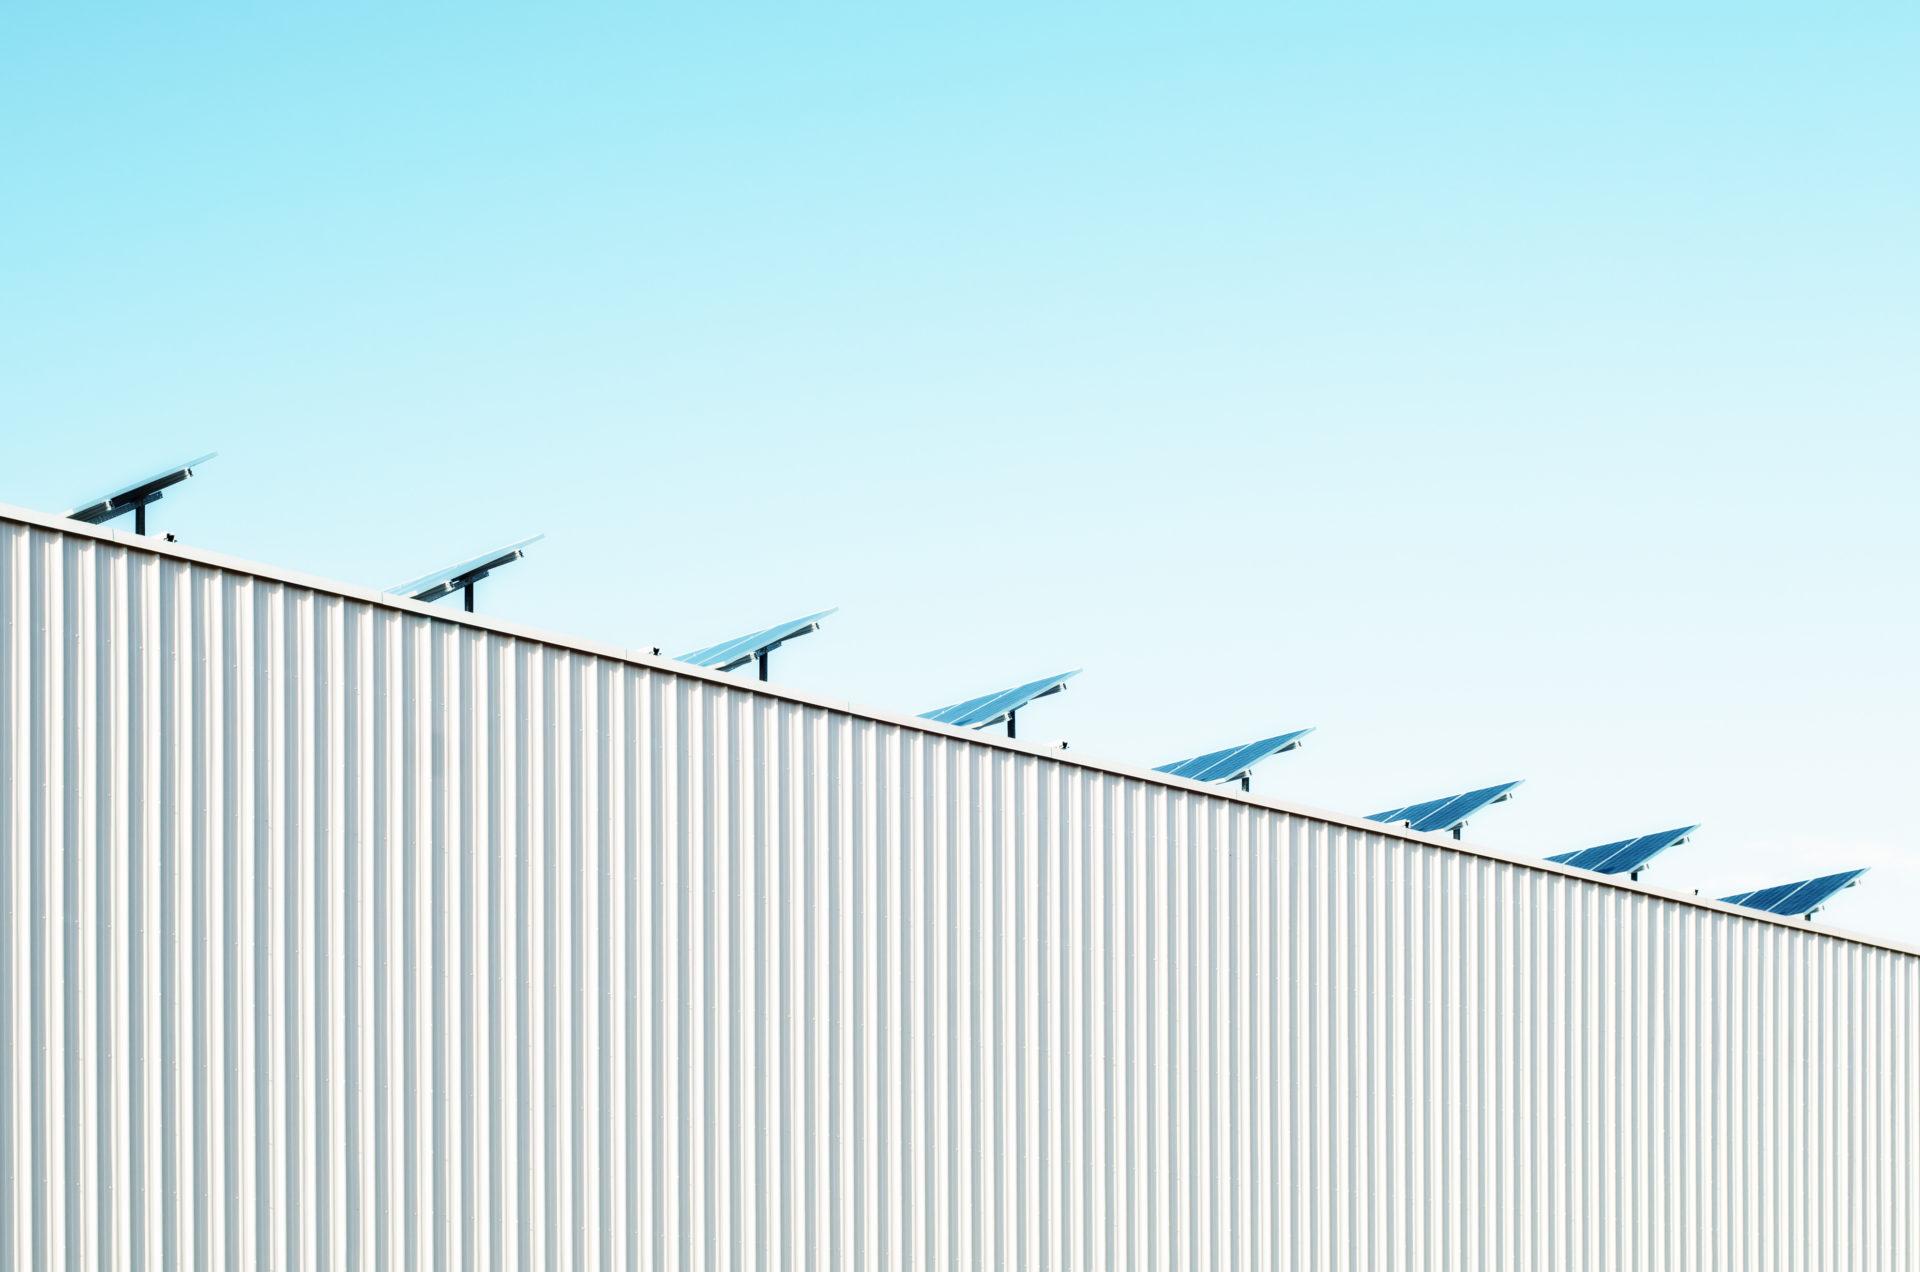 solární panely - tonaso coatings